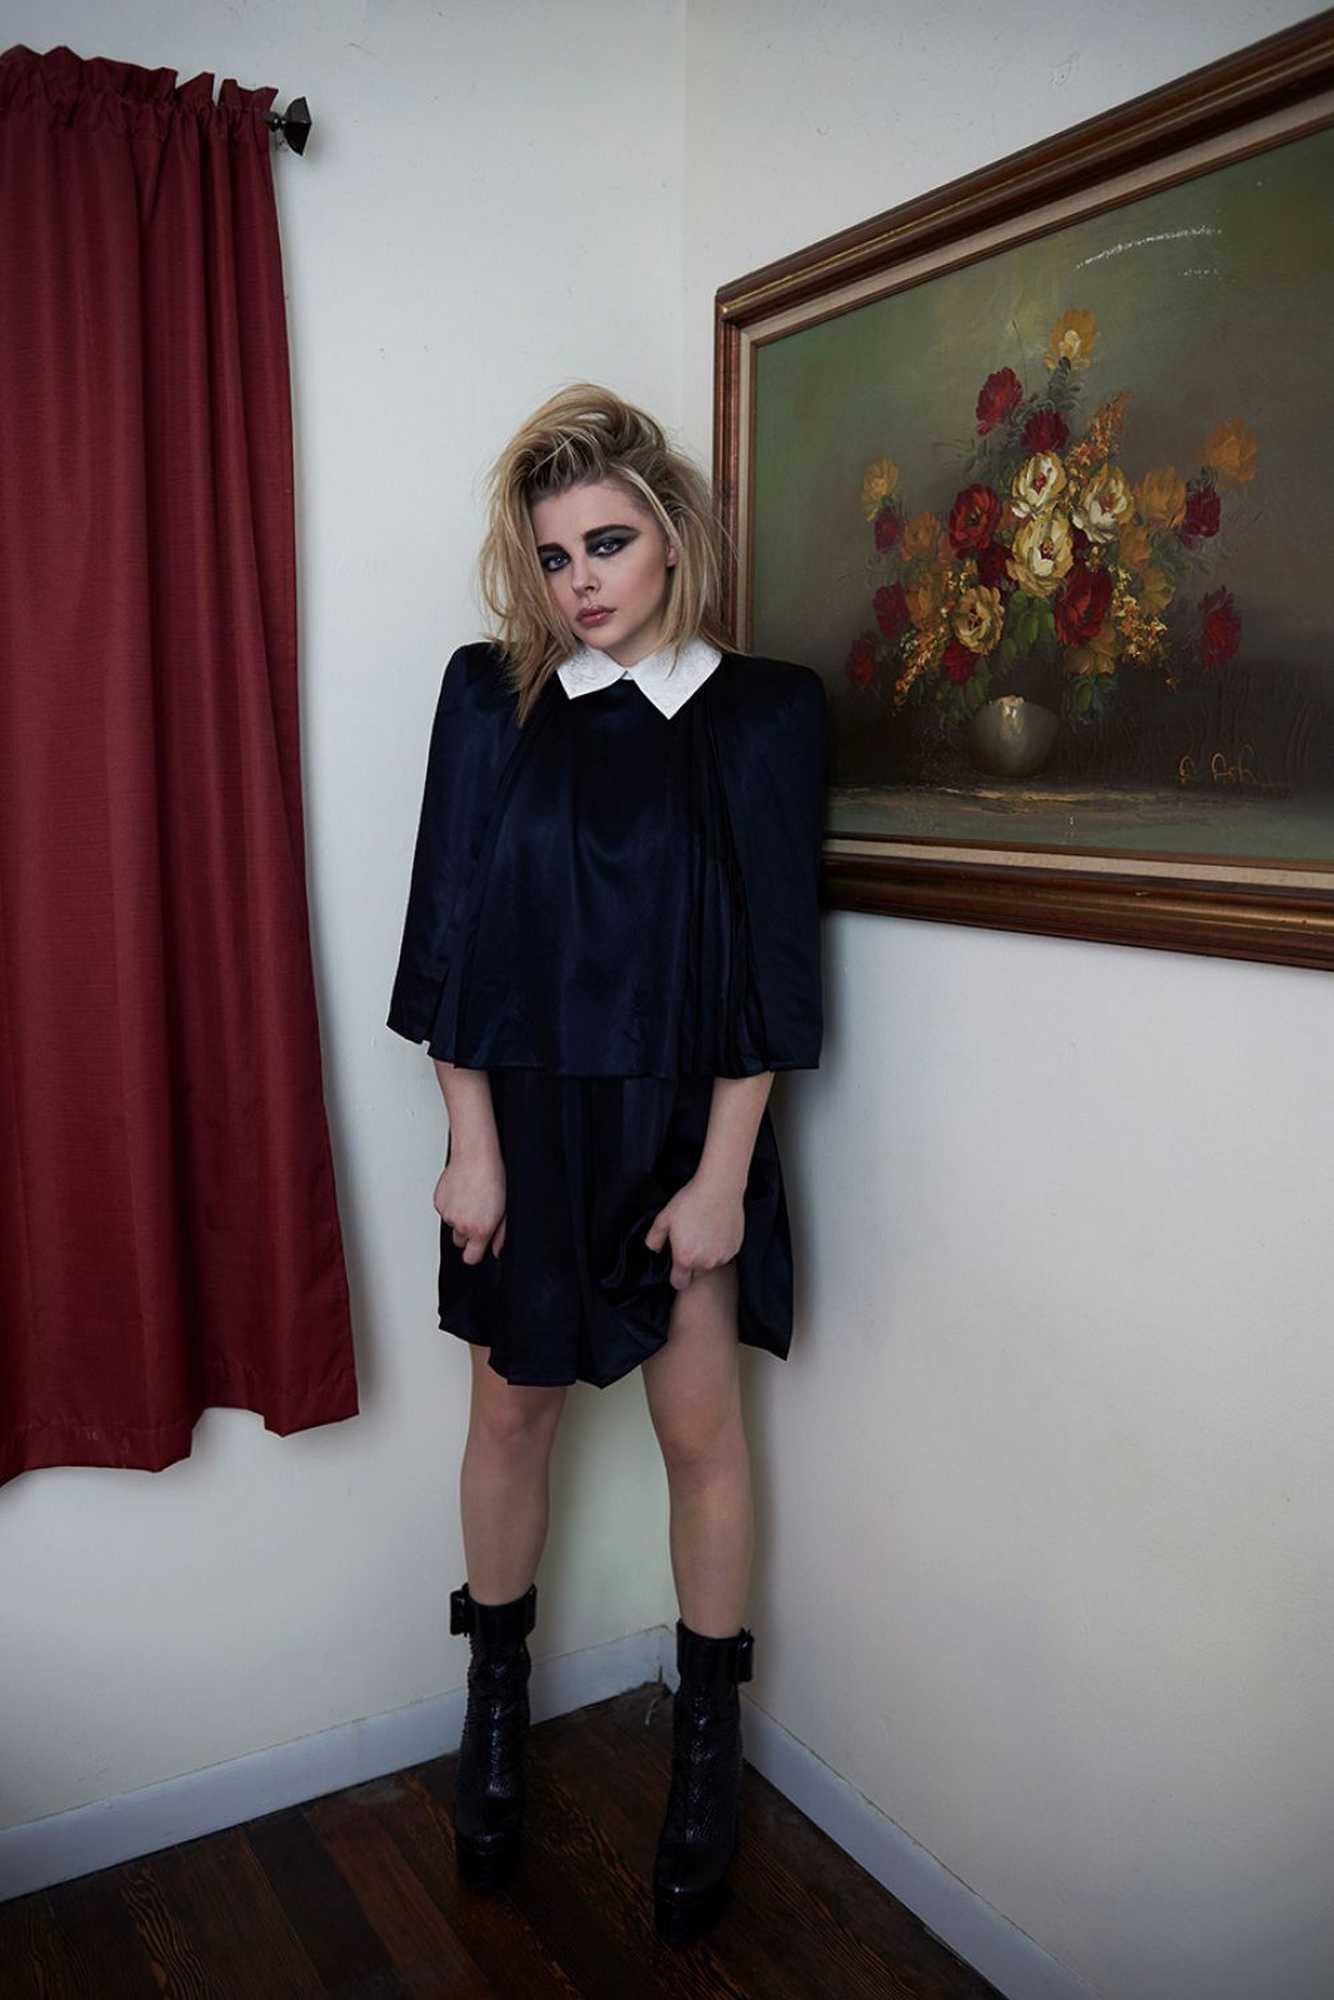 Chloe-Moretz-Frederic-Auerbach-for-Flaunt-Magazine-Issue-162-October-201884216258_335262993570844.jpg